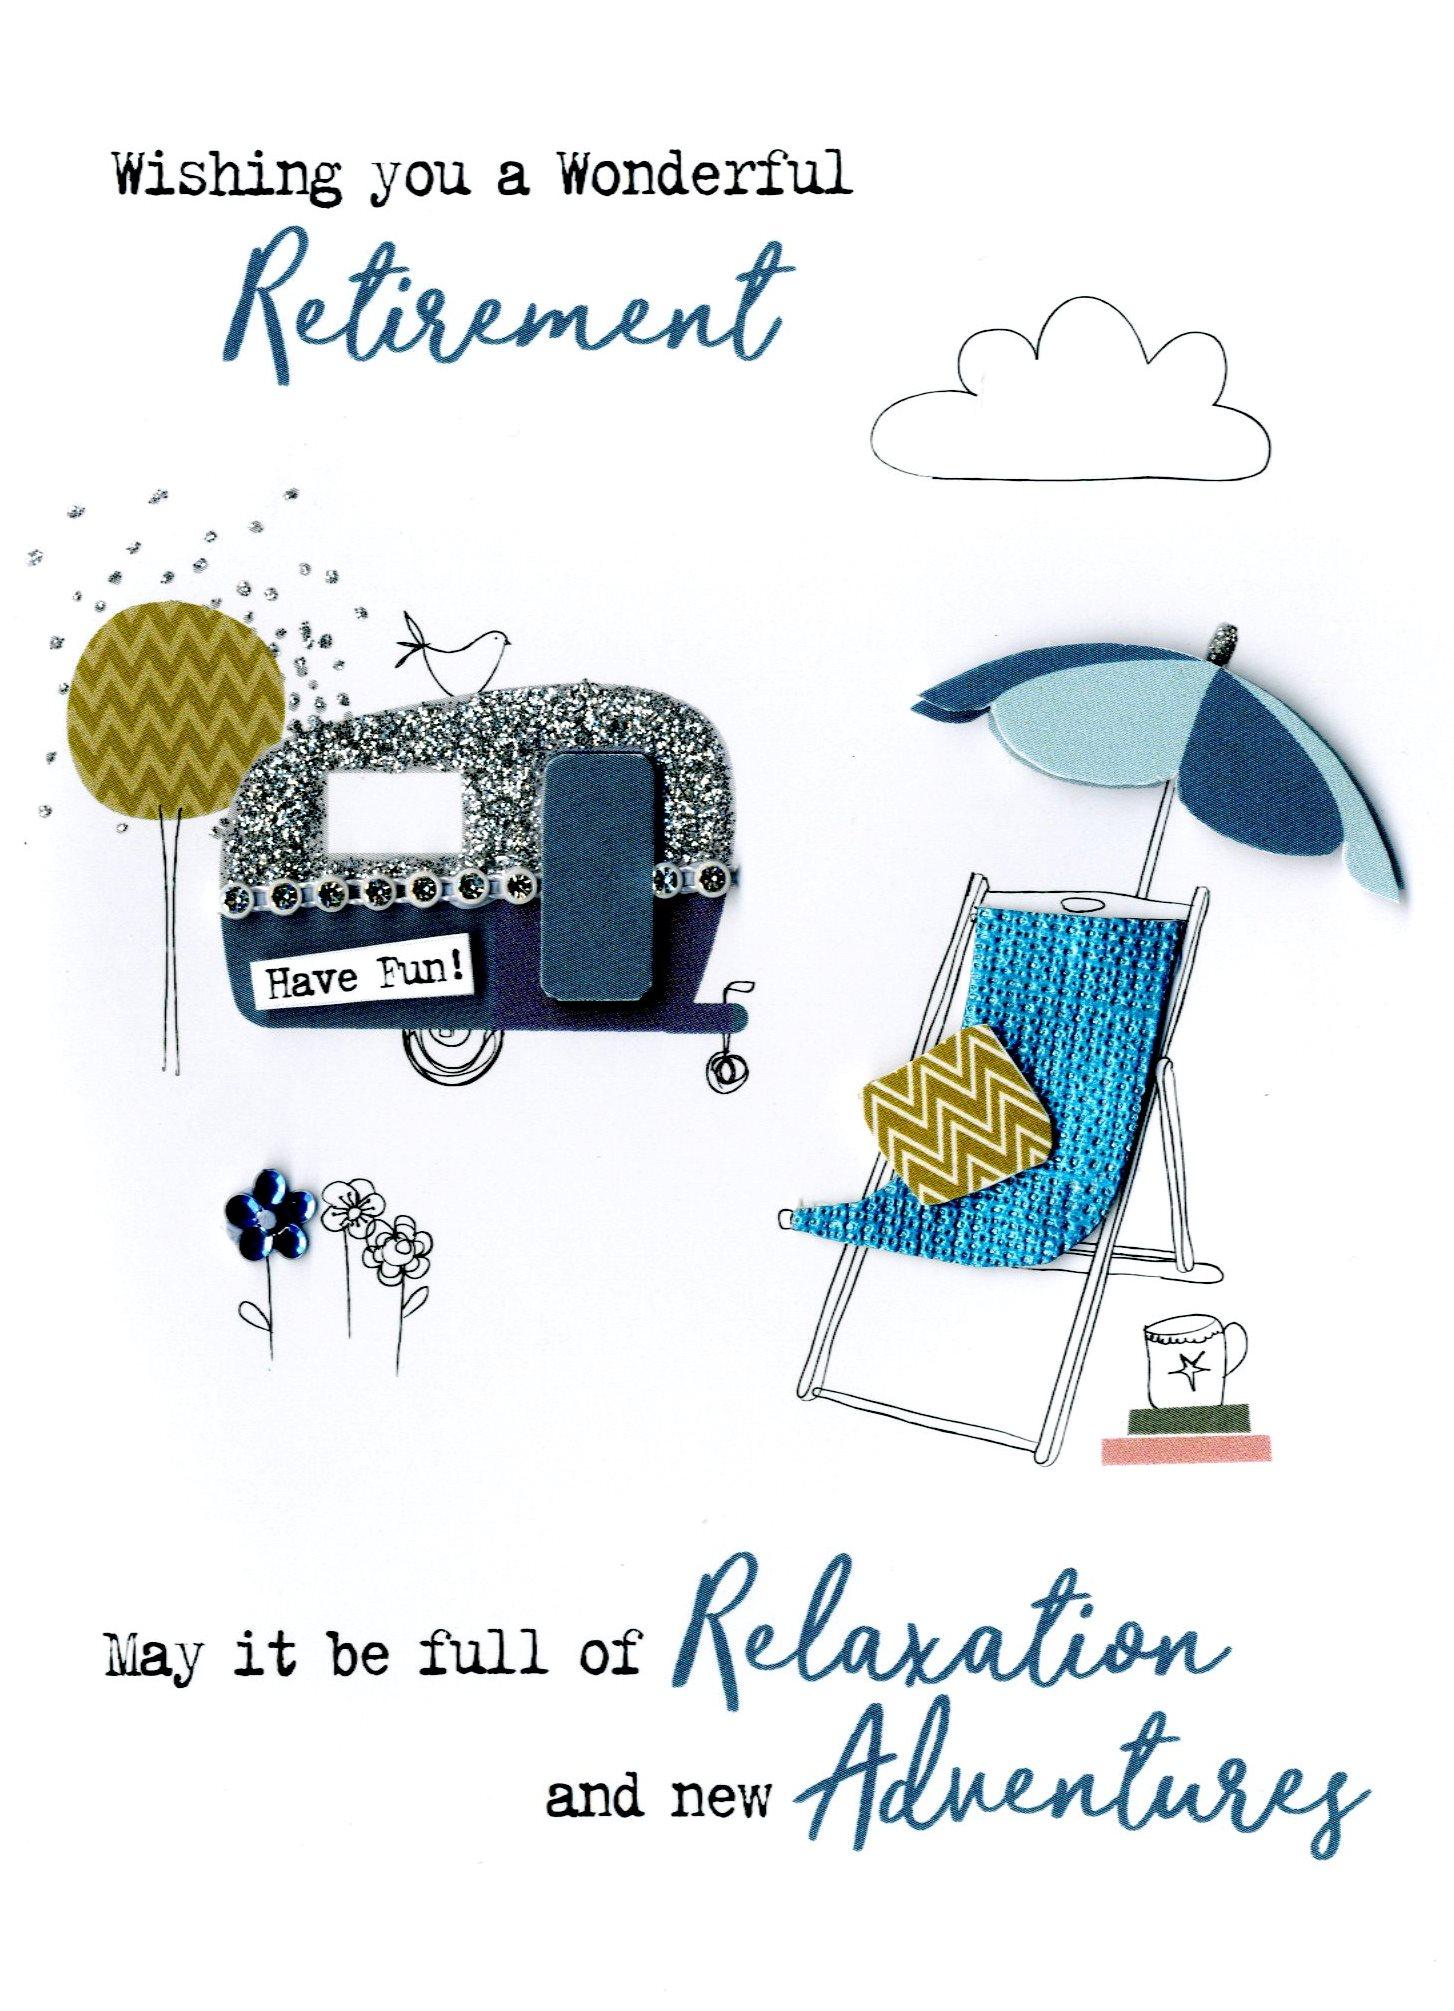 Wonderful Retirement Irresistible Greeting Card | Cards ...